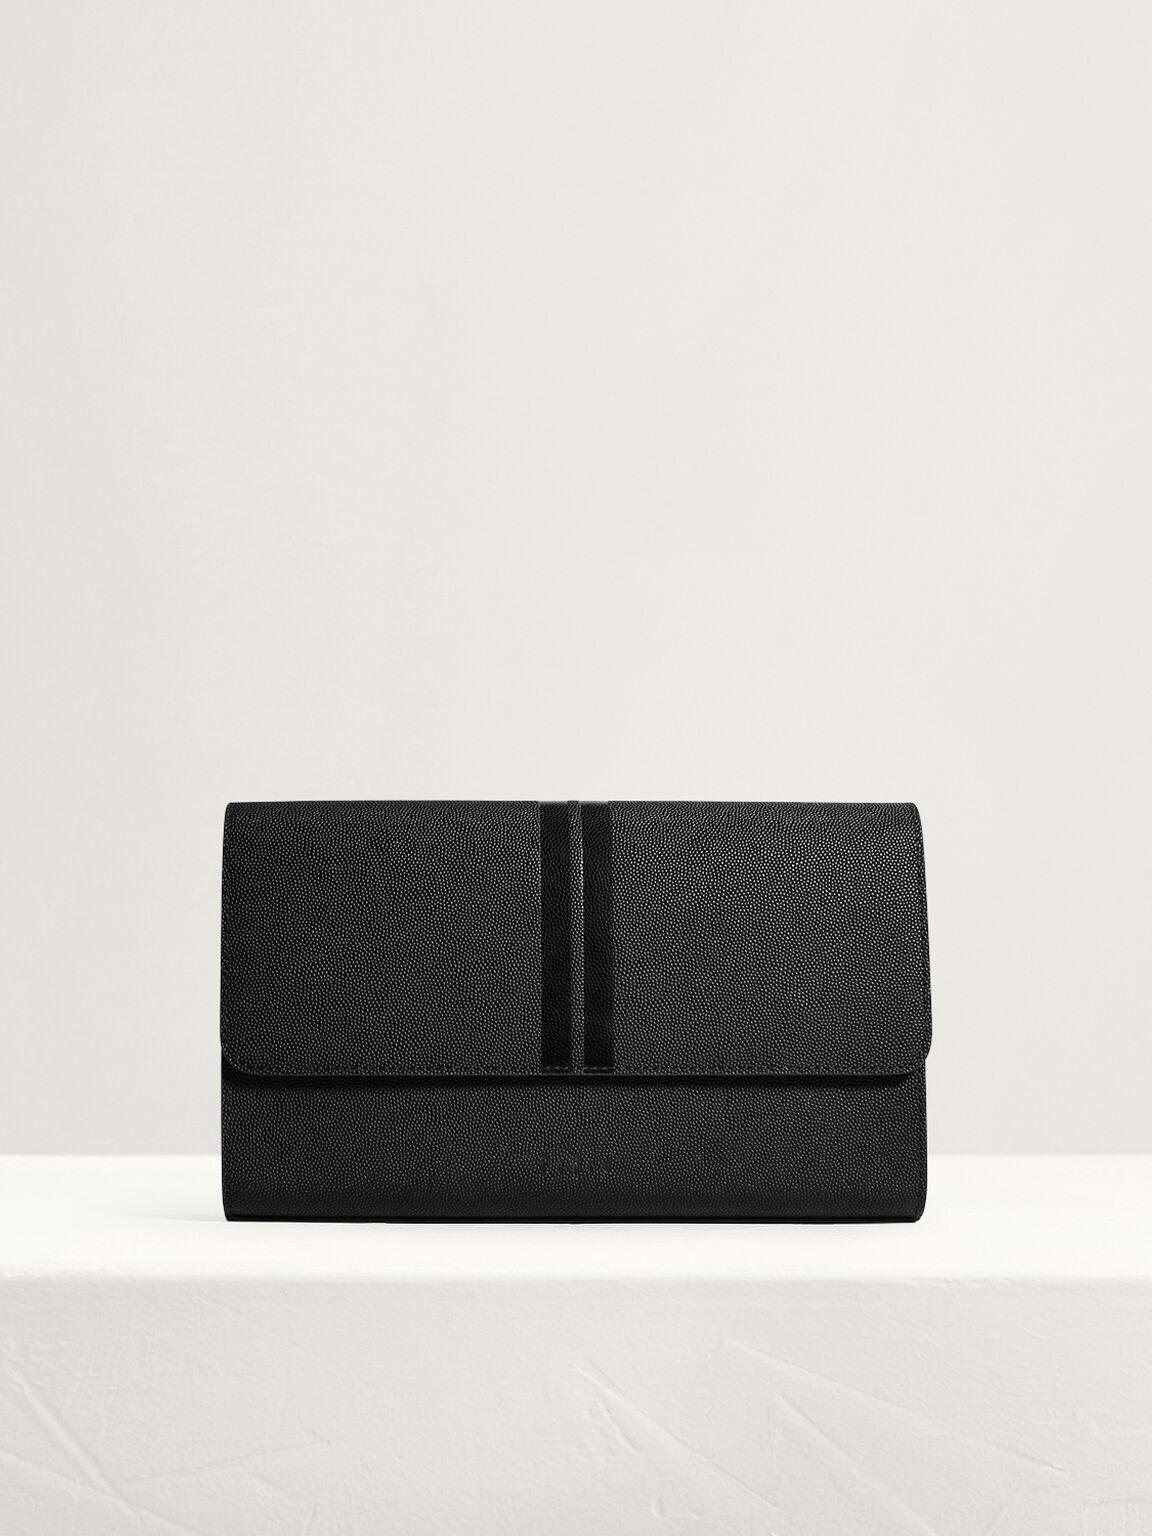 Striped Leather Clutch, Black, hi-res